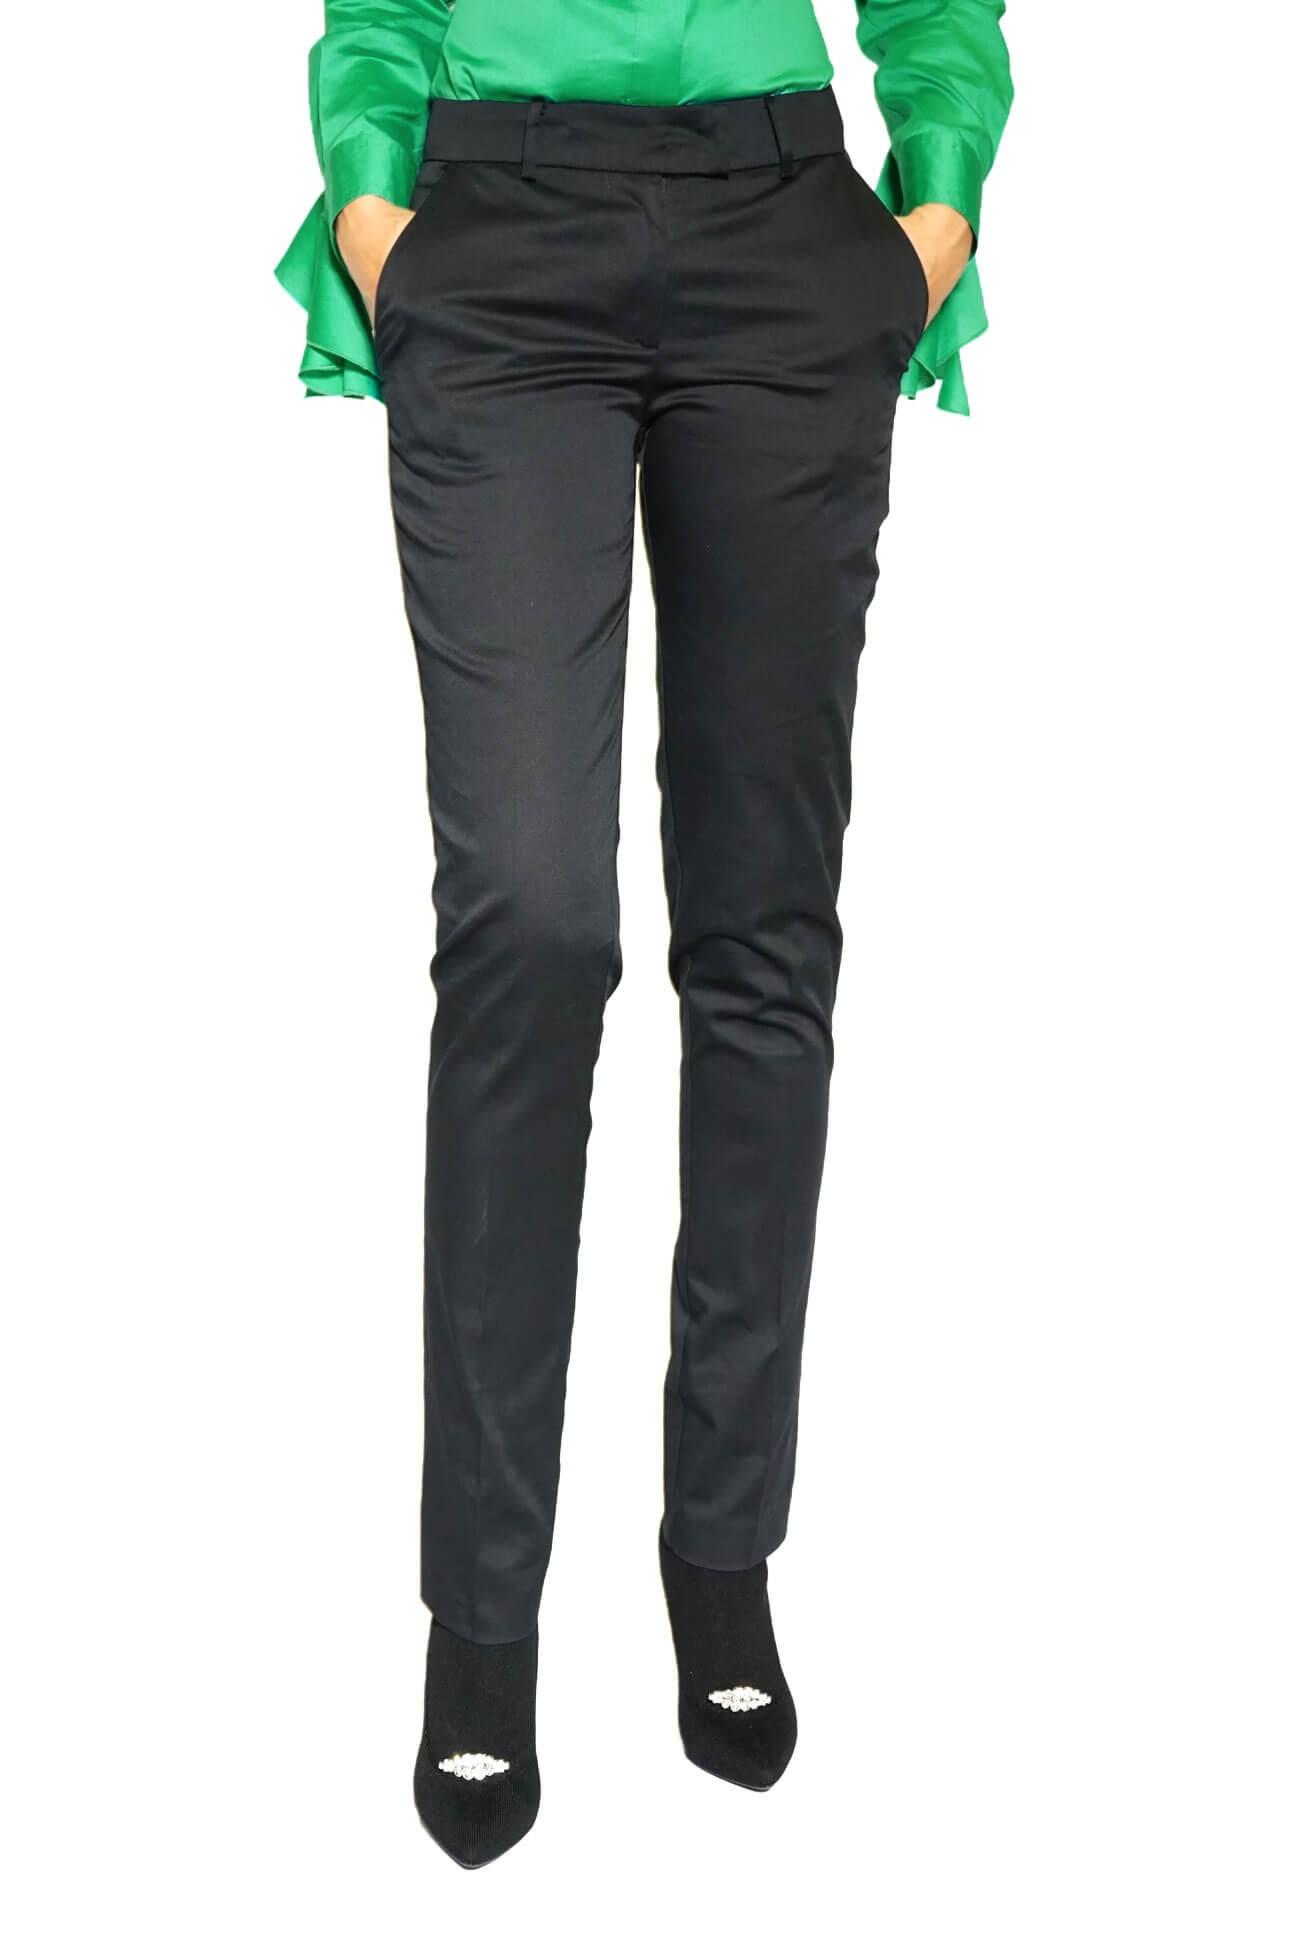 pantalon negru  lung drept